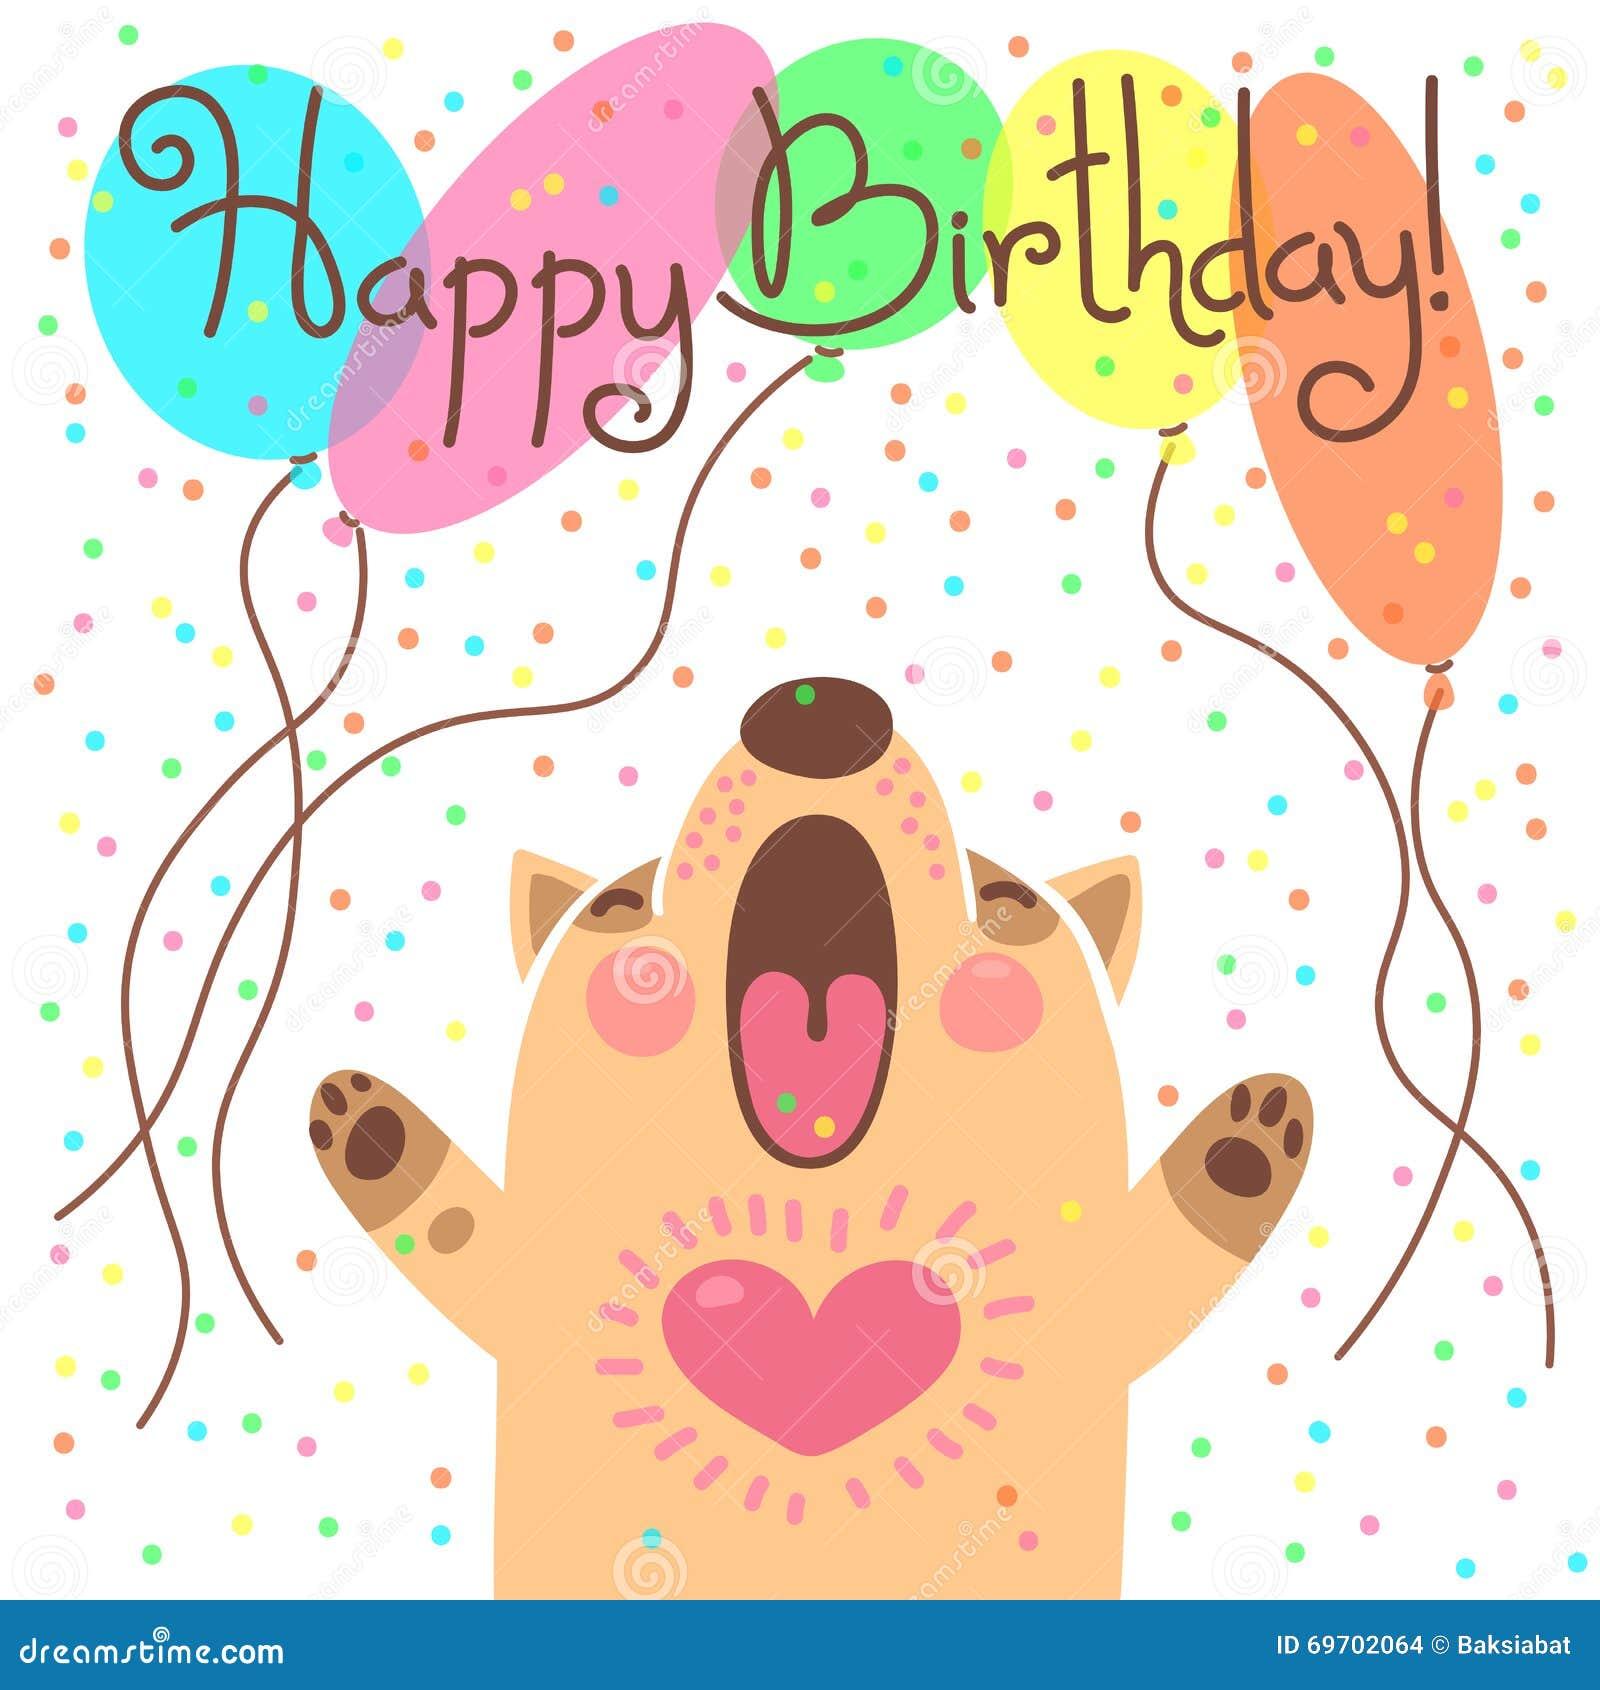 Dog Birthday Party Invitation is beautiful invitation sample